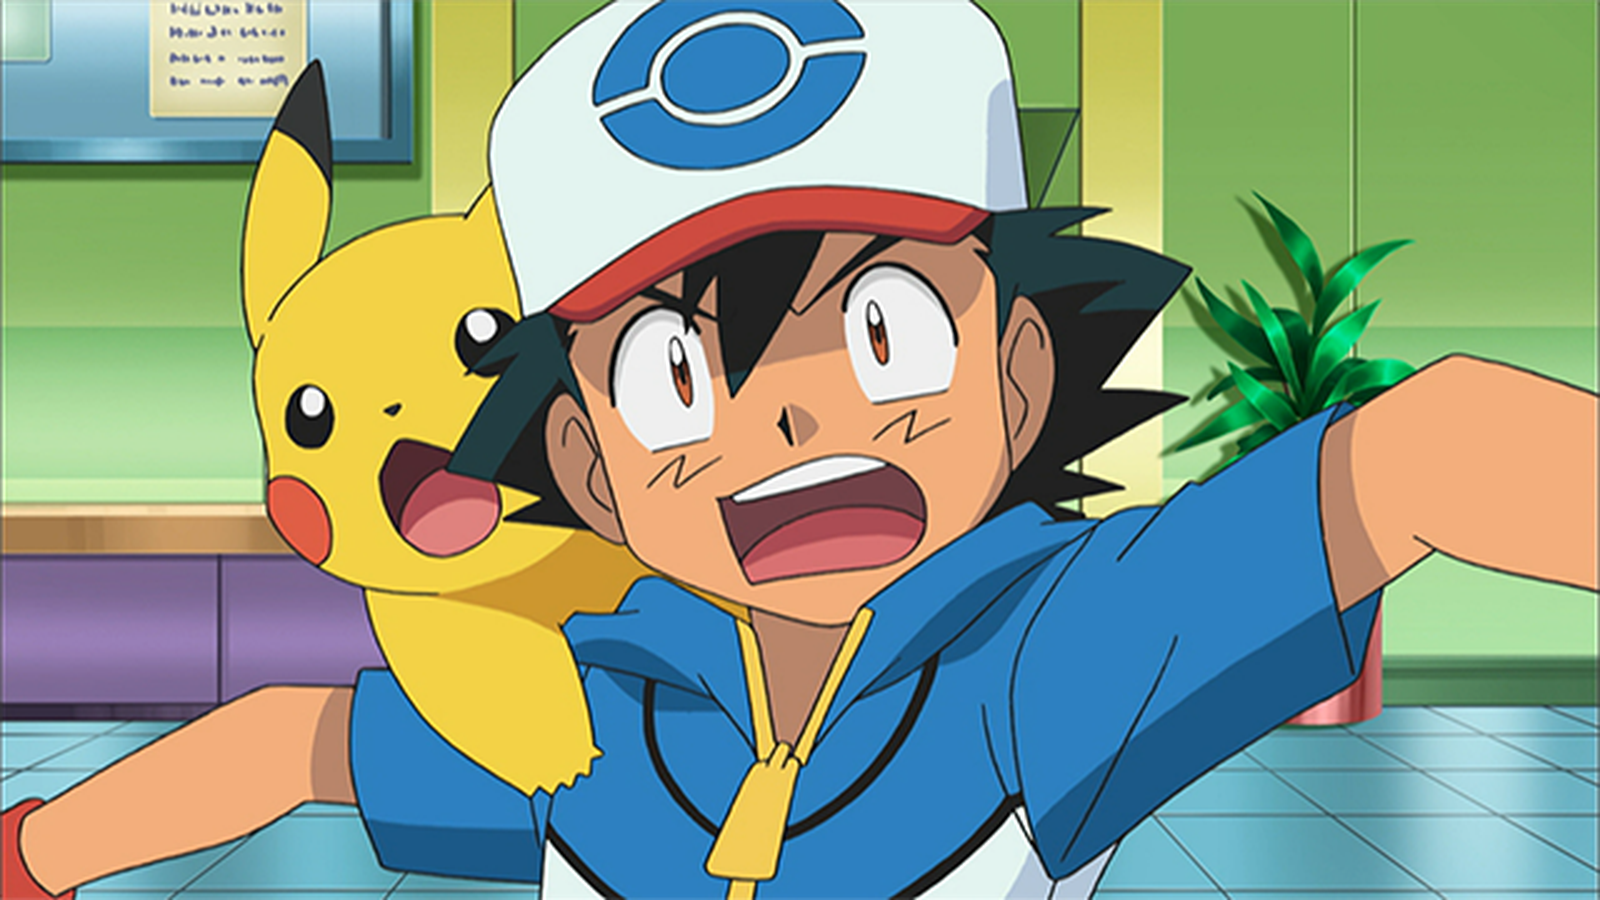 Twitch hosting 32 hour long Pokemon cartoon stream for